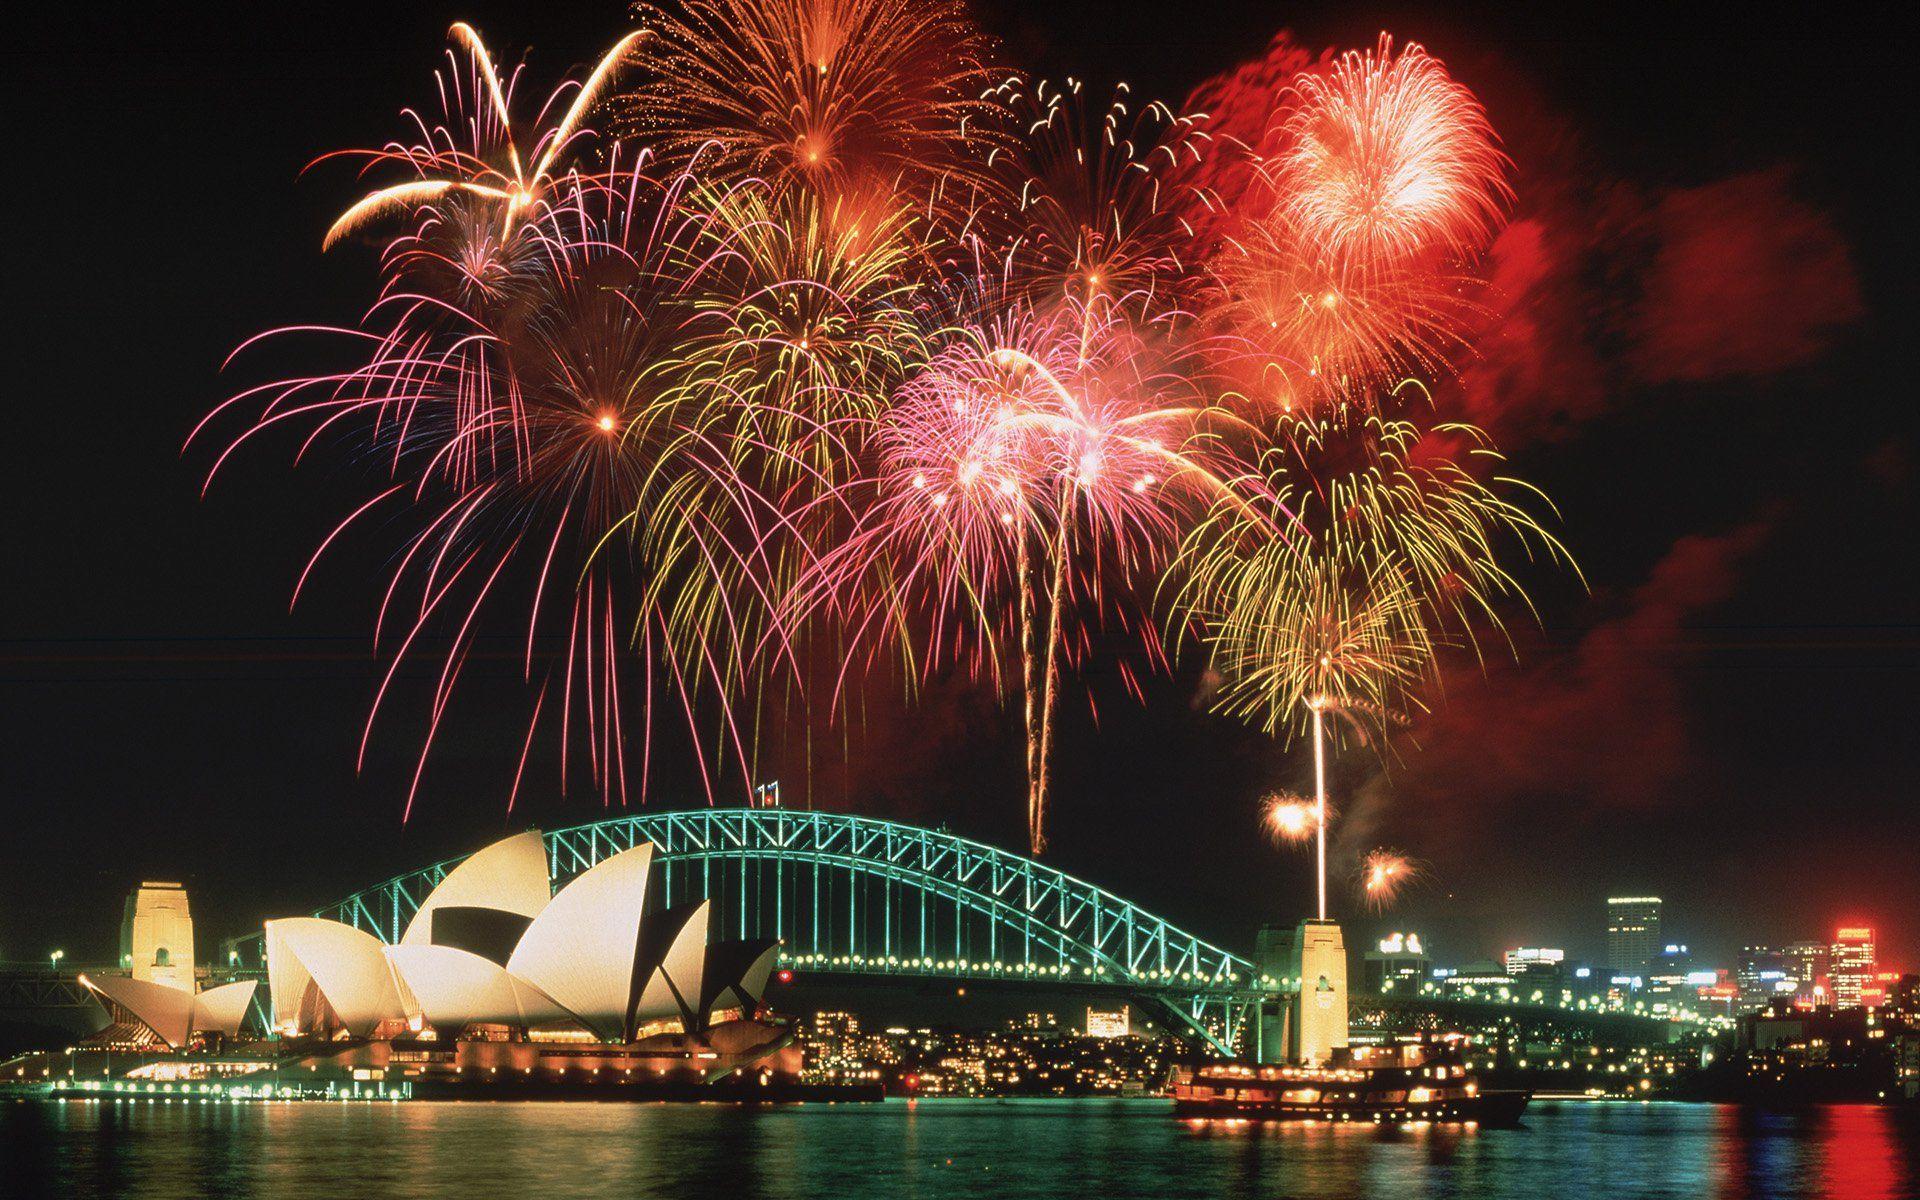 10 Top Spots For Sydney Nye Fireworks Fireworks Photography Fireworks New Year Fireworks